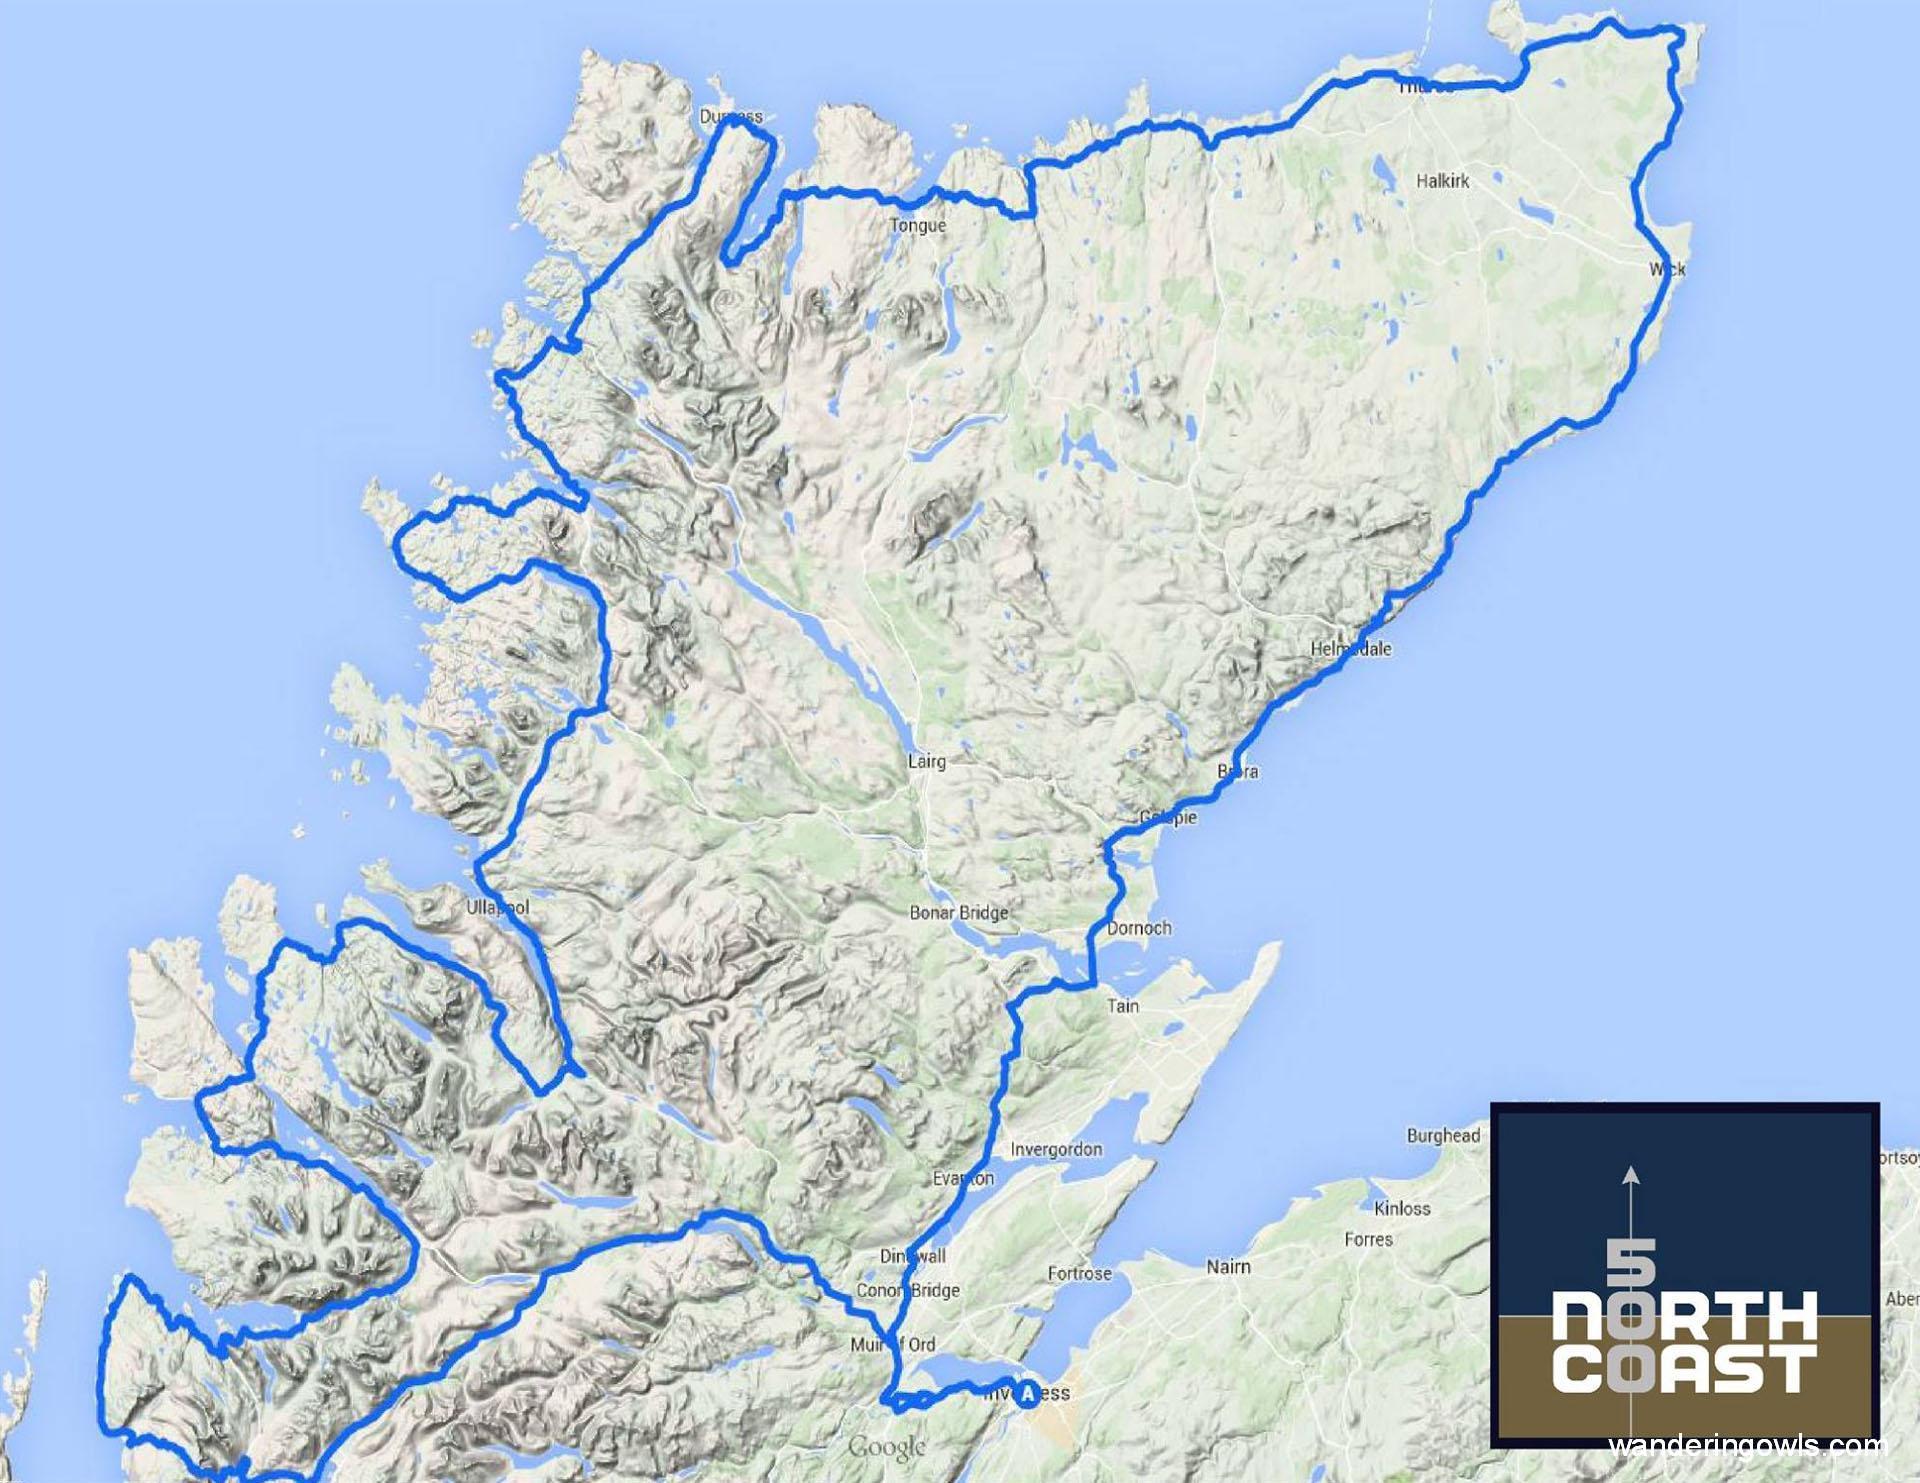 north-coast-500-route-map-scotland.jpg